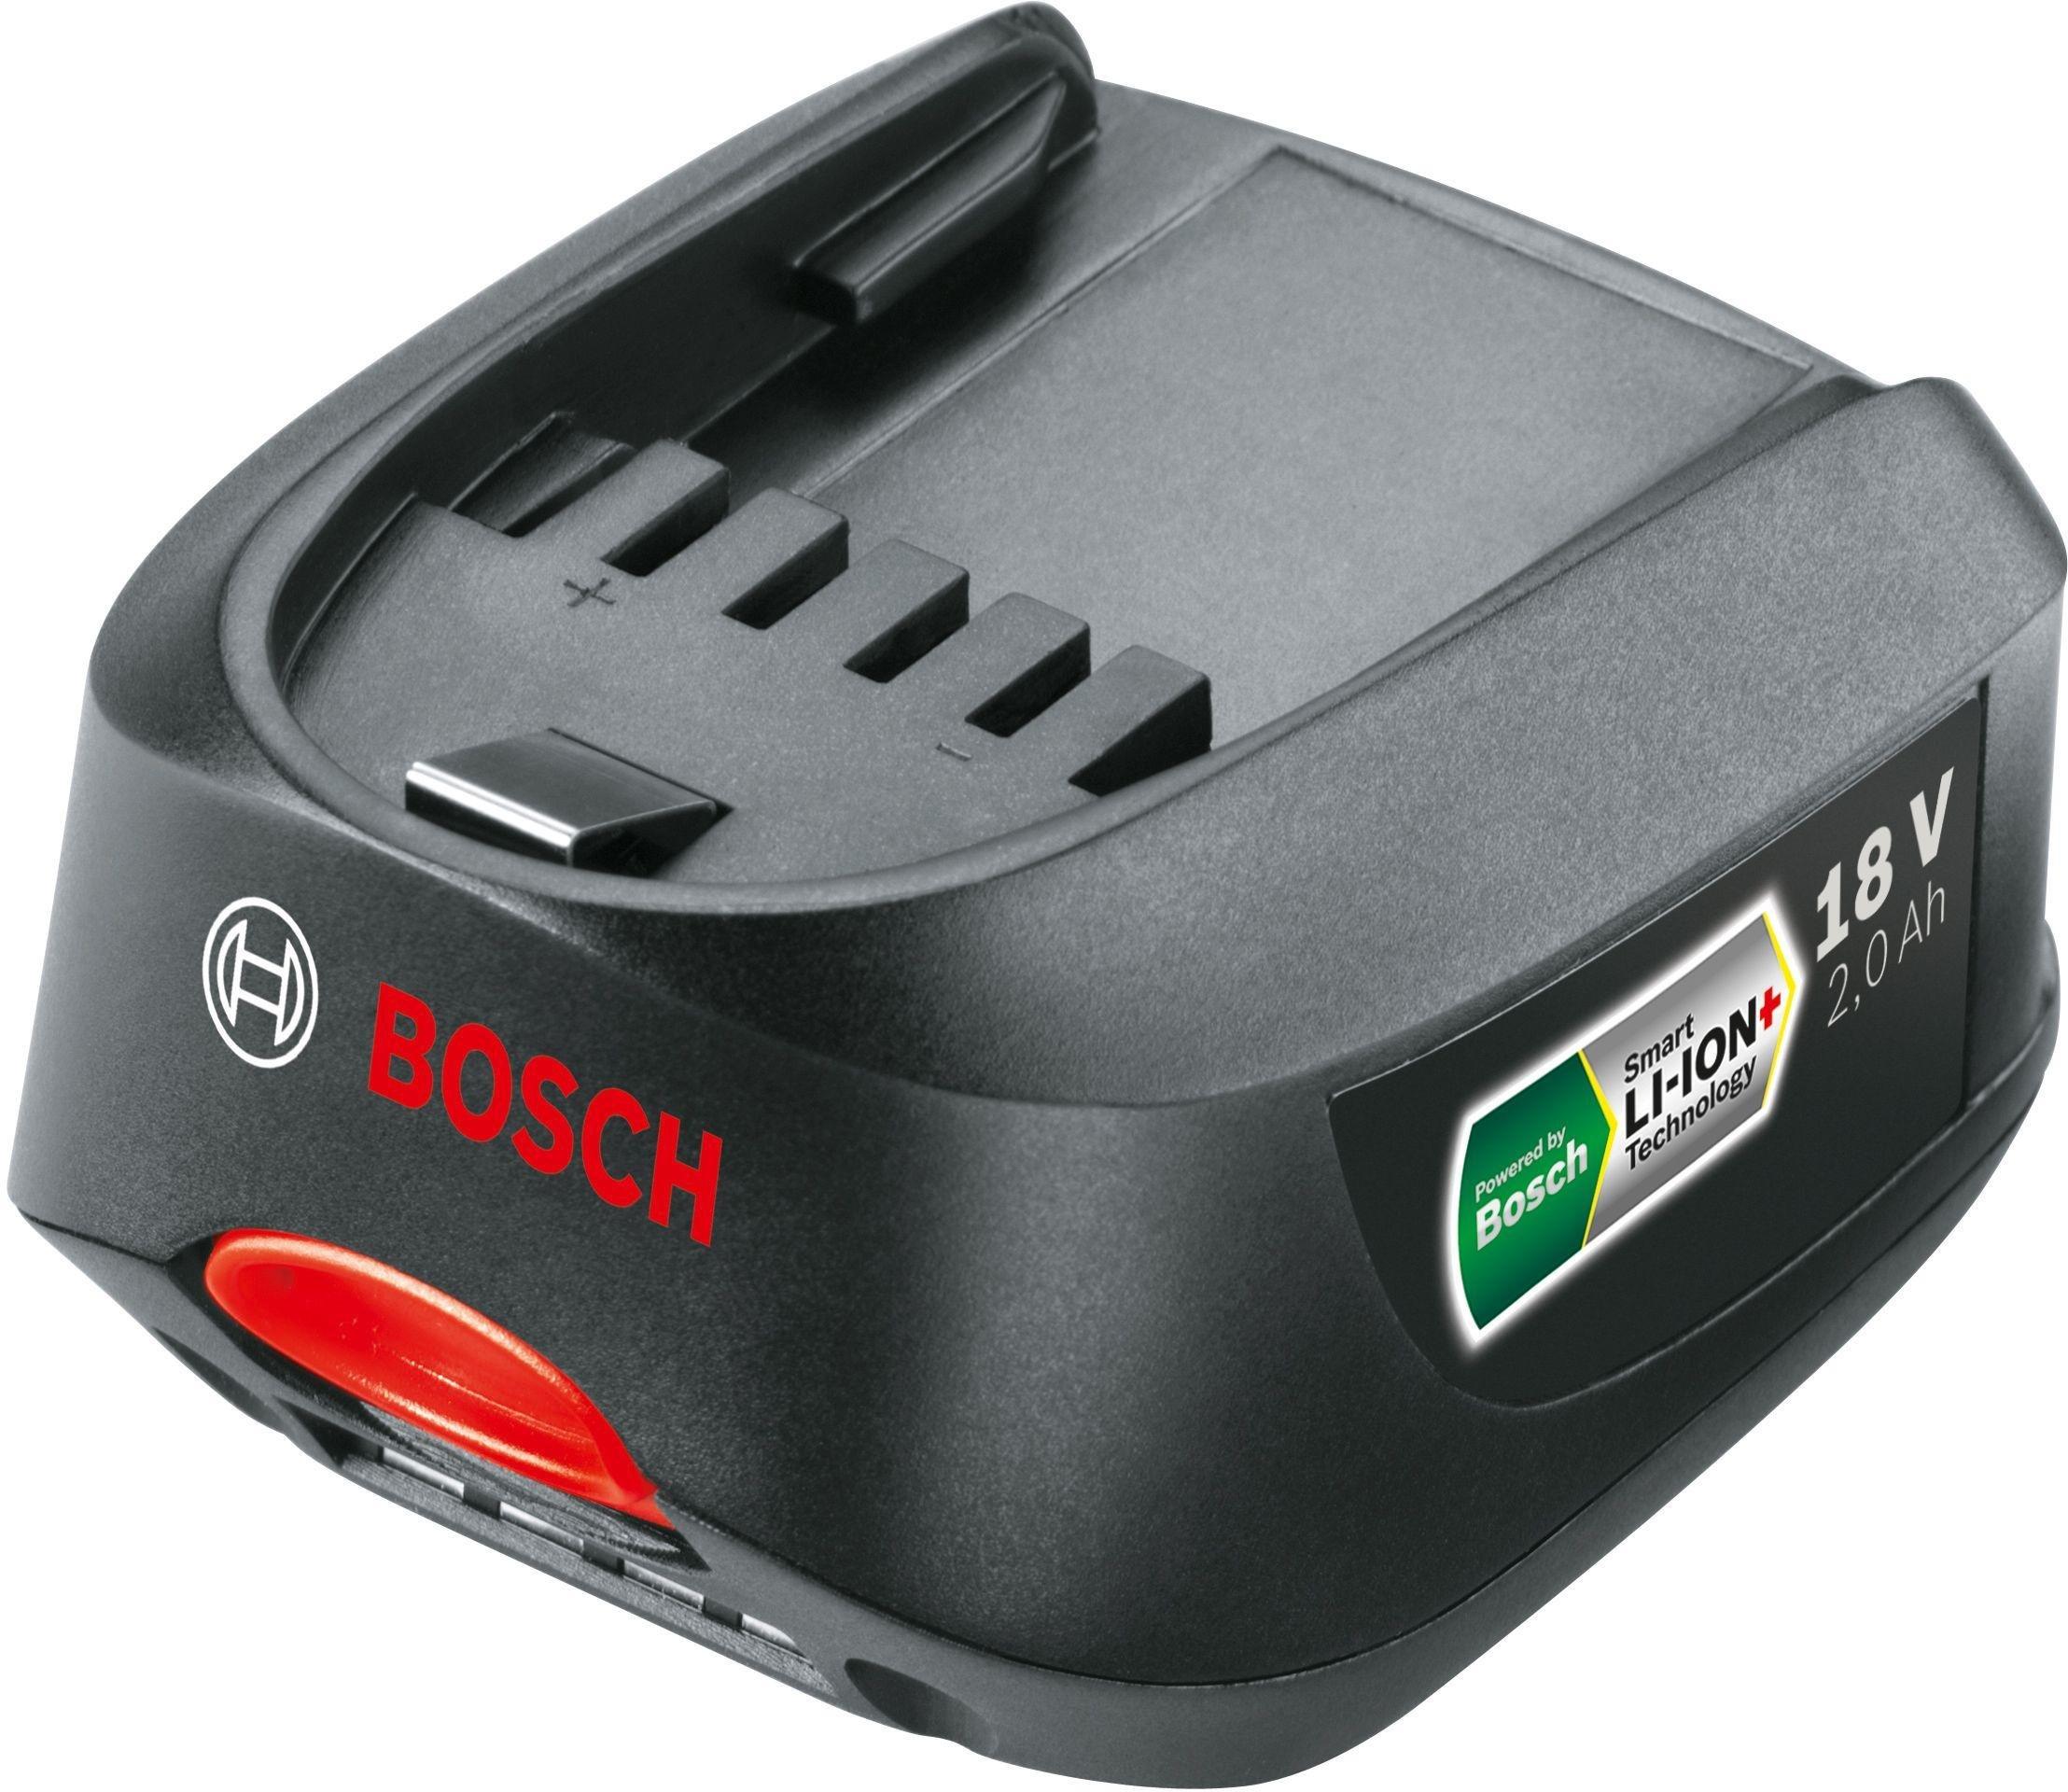 Image of Bosch - 18 Volt Battery Pack 20Ah